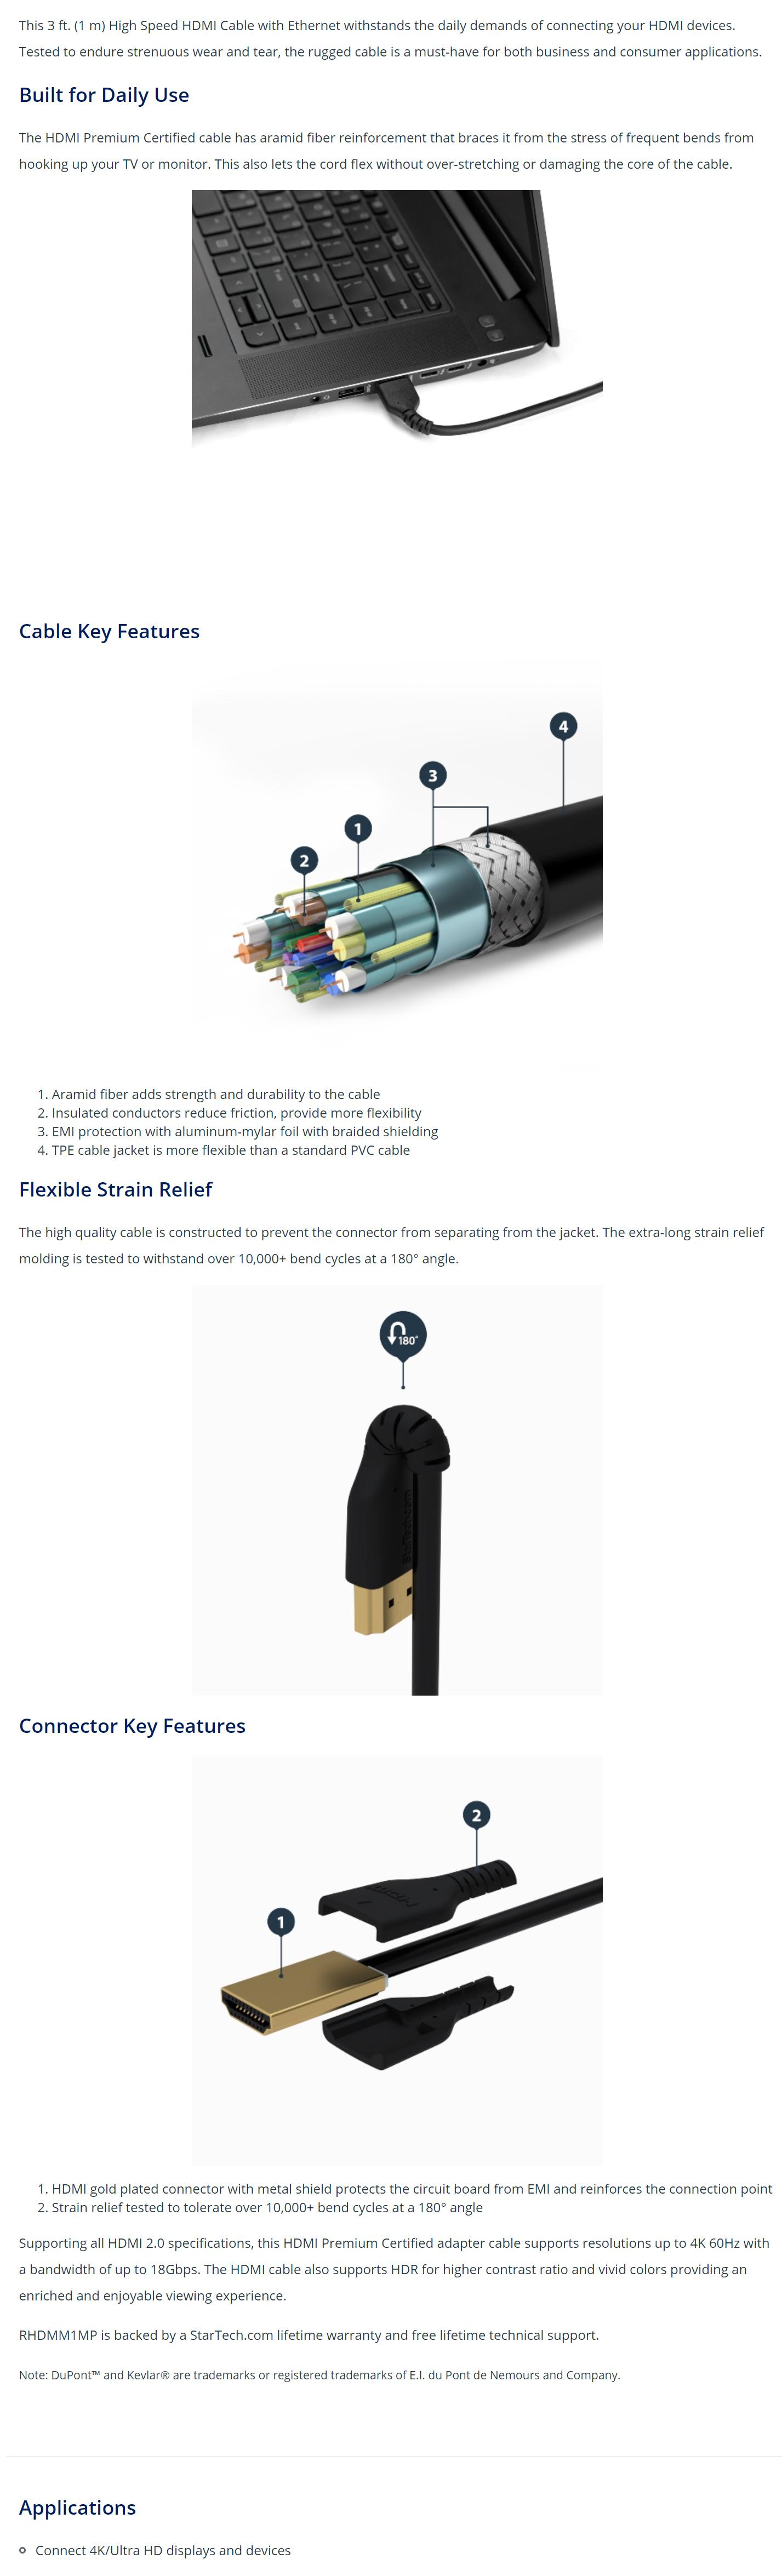 screencapture-startech-en-au-cables-rhdmm1mp-2021-07-09-13_44_16.jpg